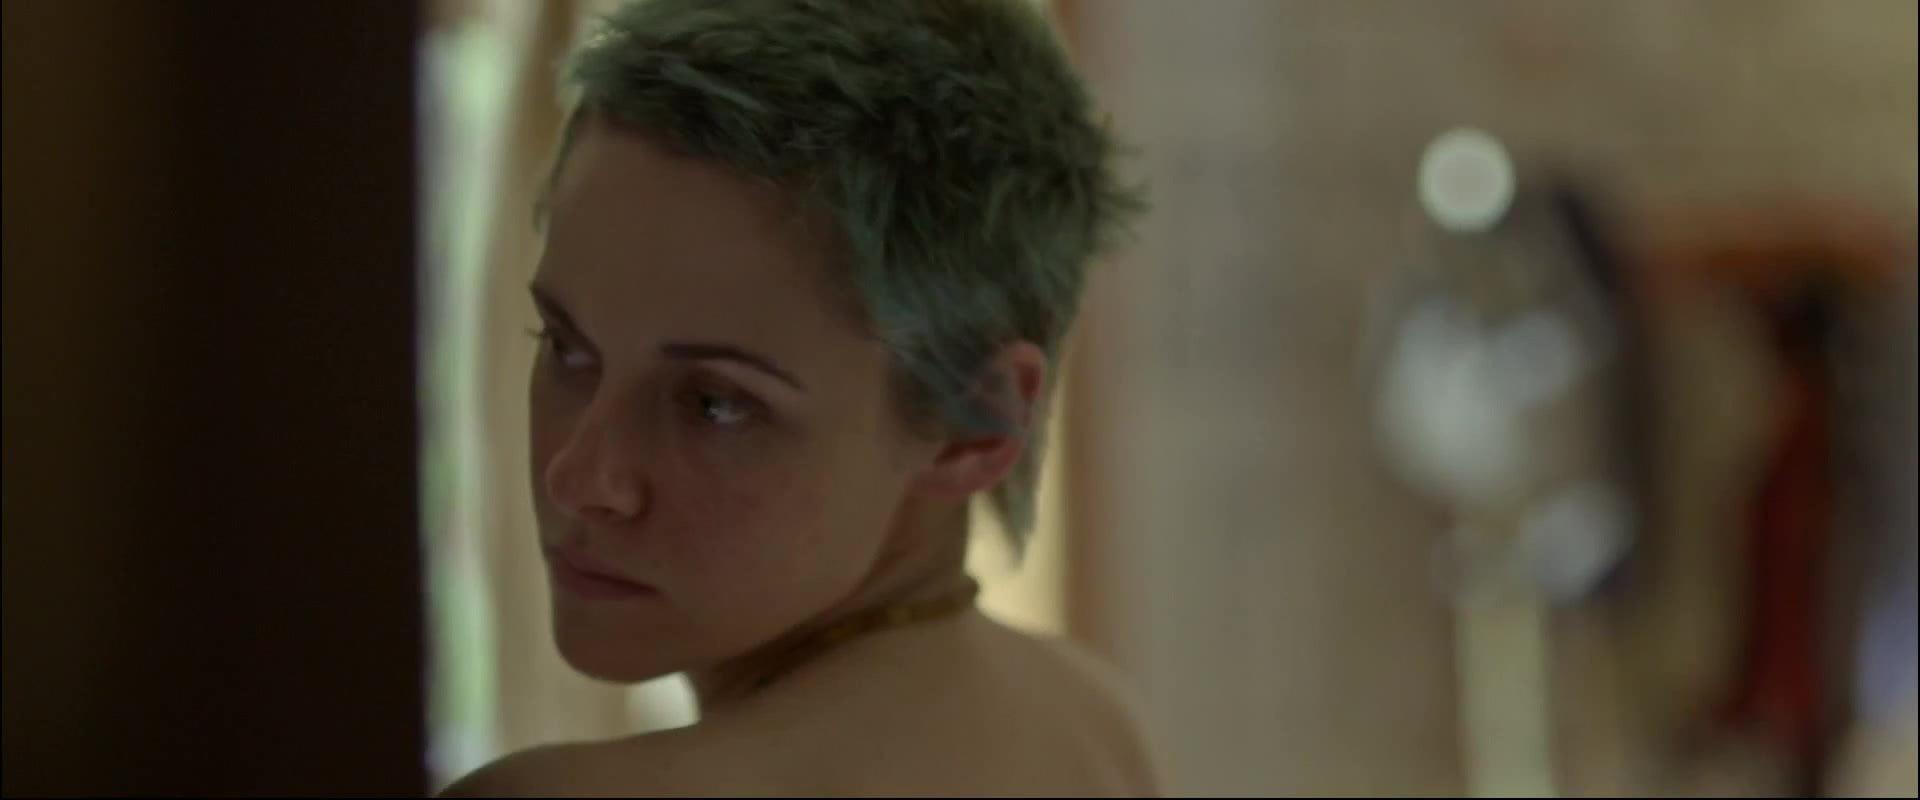 film armasarul vestului salbatic online dating: independence day 2 dublado online dating